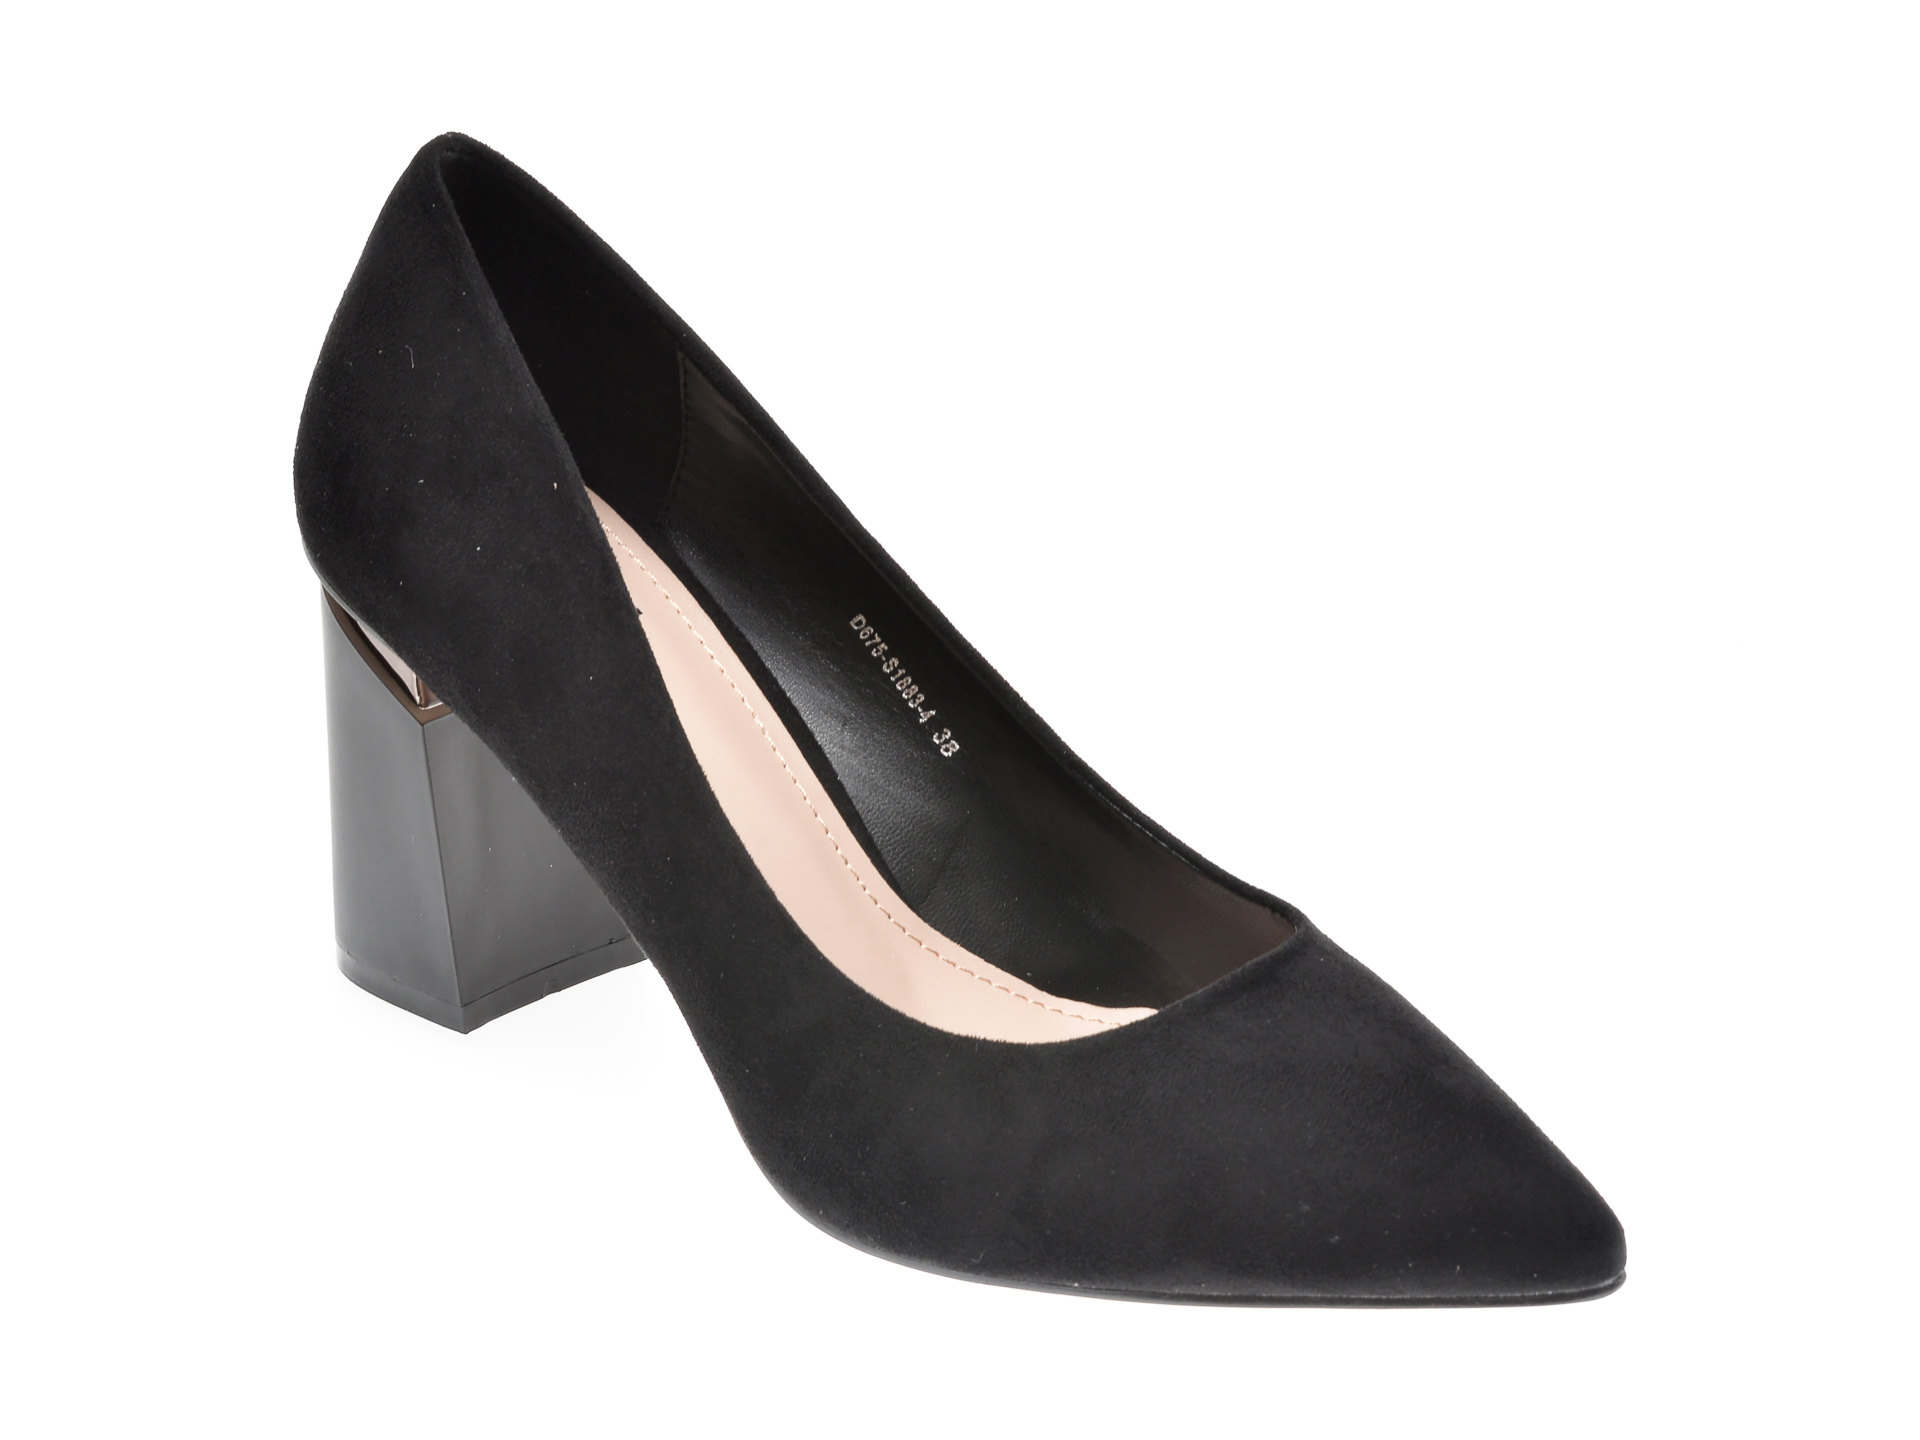 Pantofi RIO FIORE negri, S1883, din piele ecologica imagine